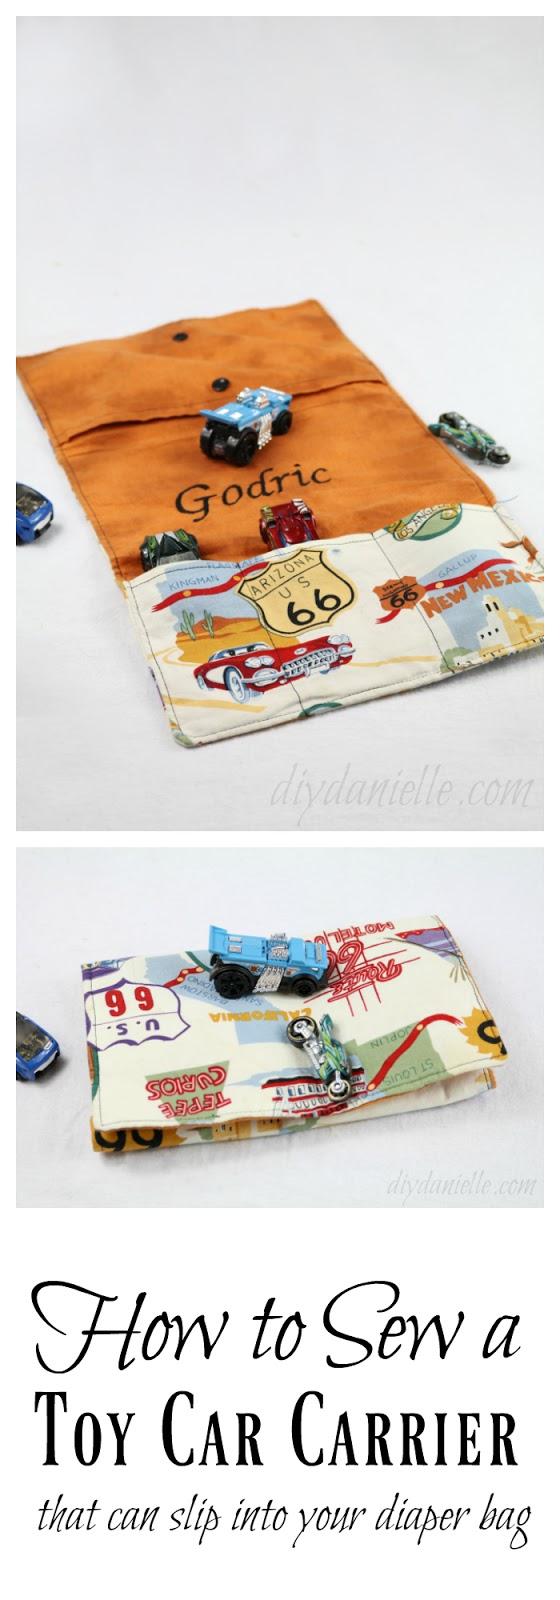 DIY Toy Car Carrier